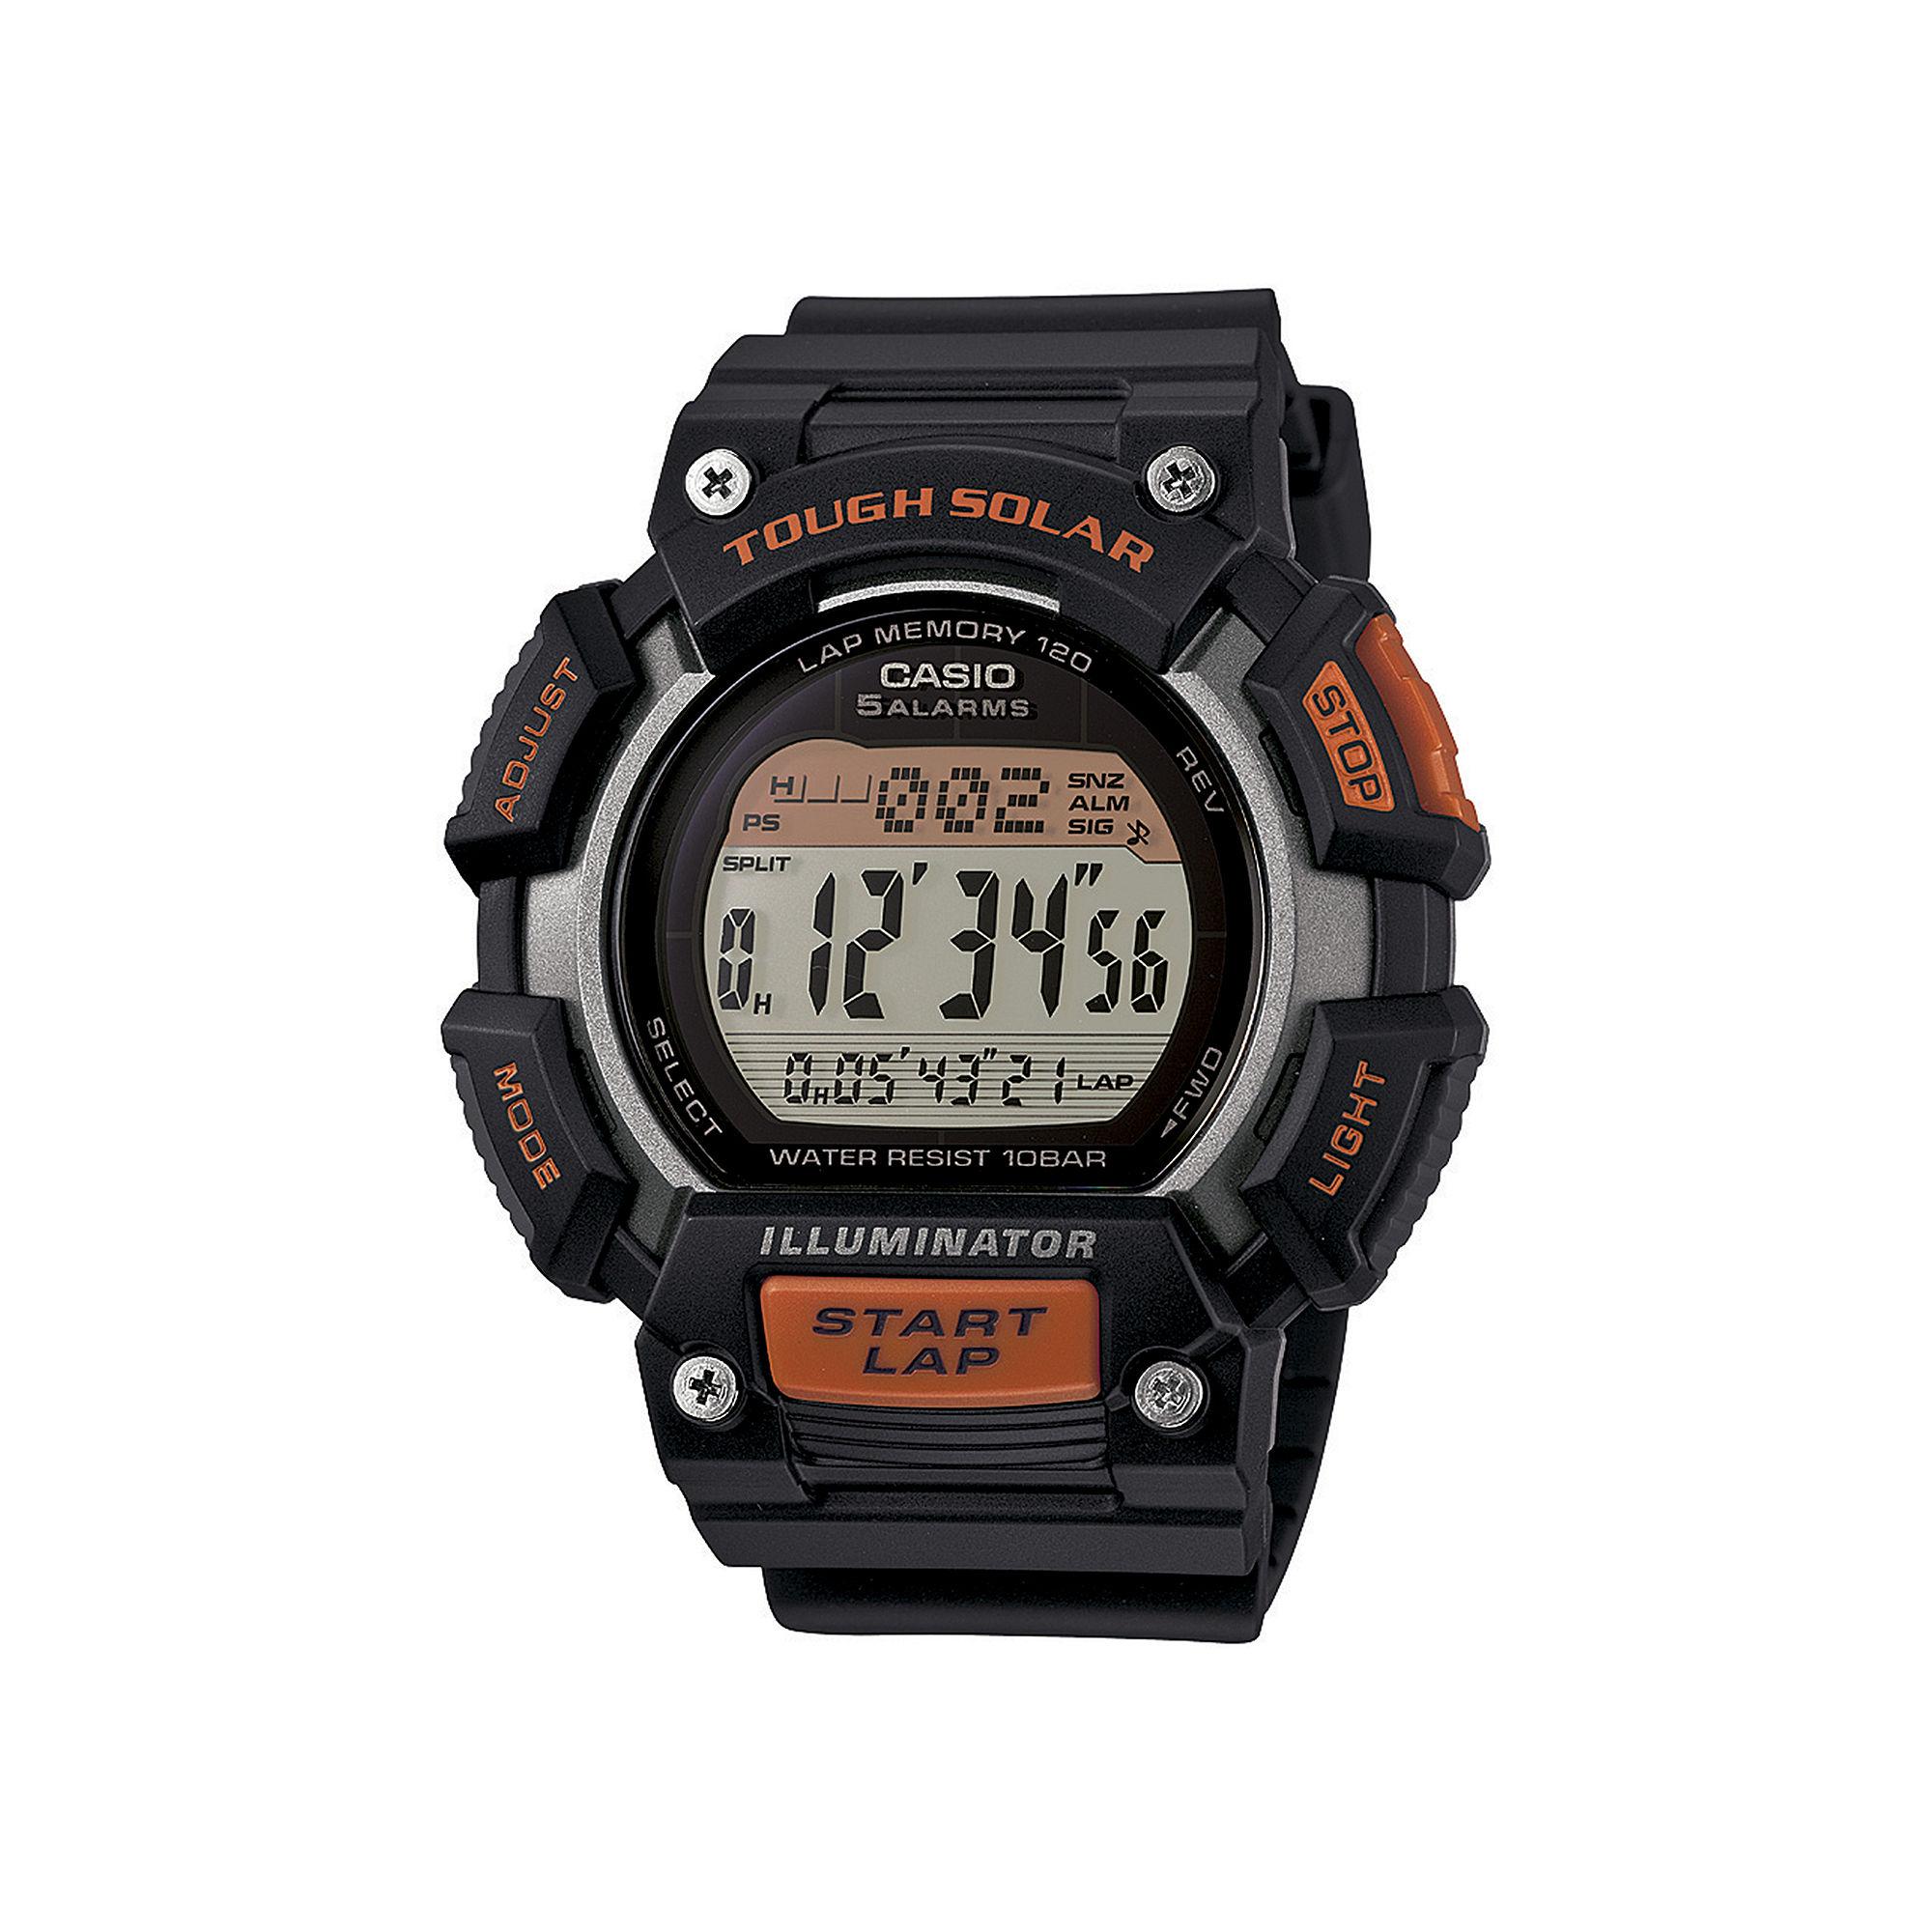 Casio Tough Solar Illuminator Mens Runner Sport Watch STLS110H-1A